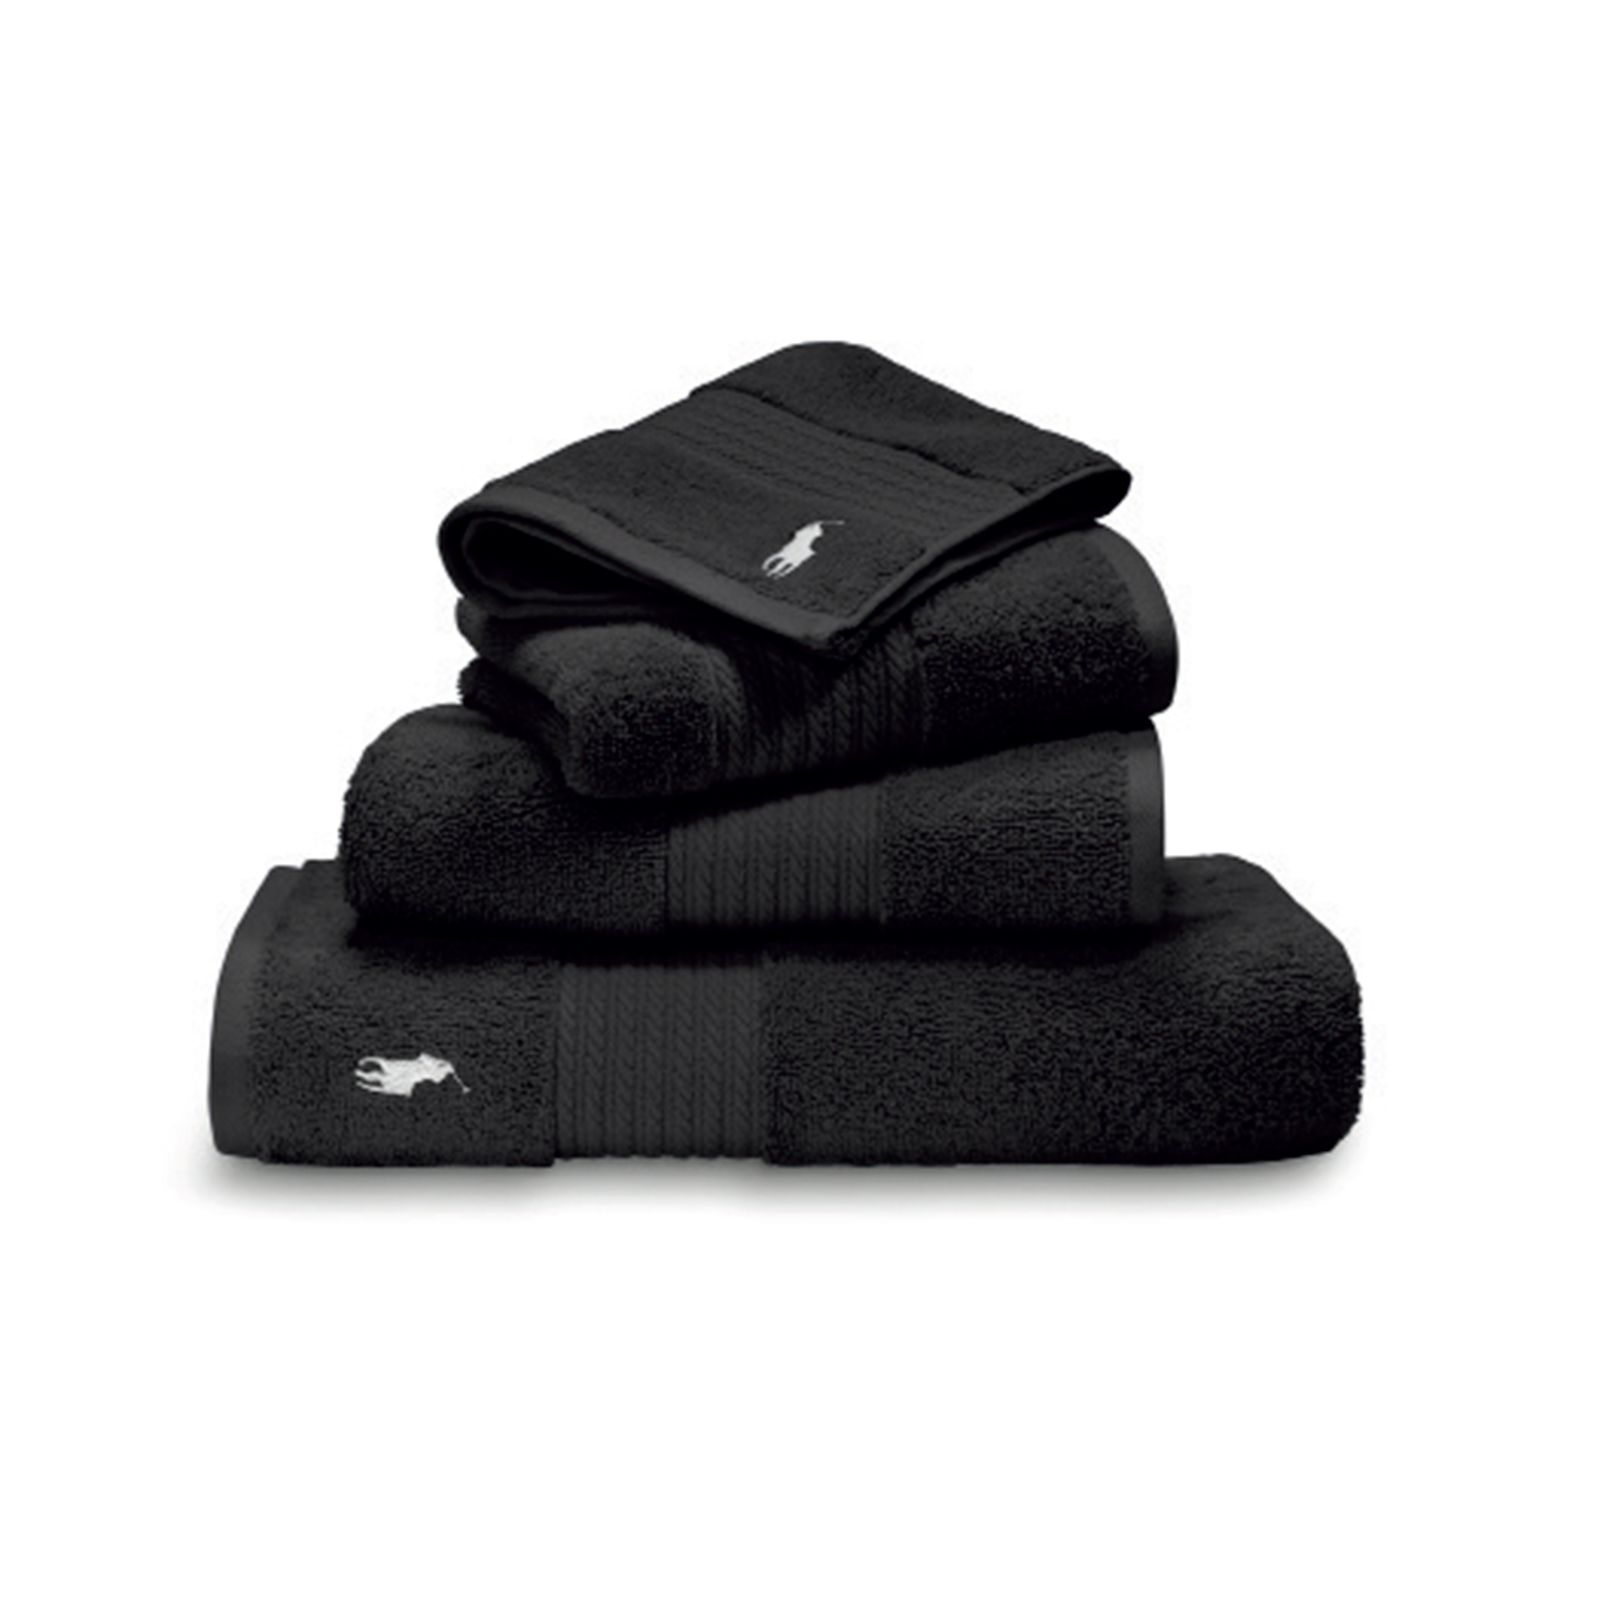 ca847ccd Ręcznik player RALPH LAUREN HOME – Kup Teraz! Najlepsze ceny i ...